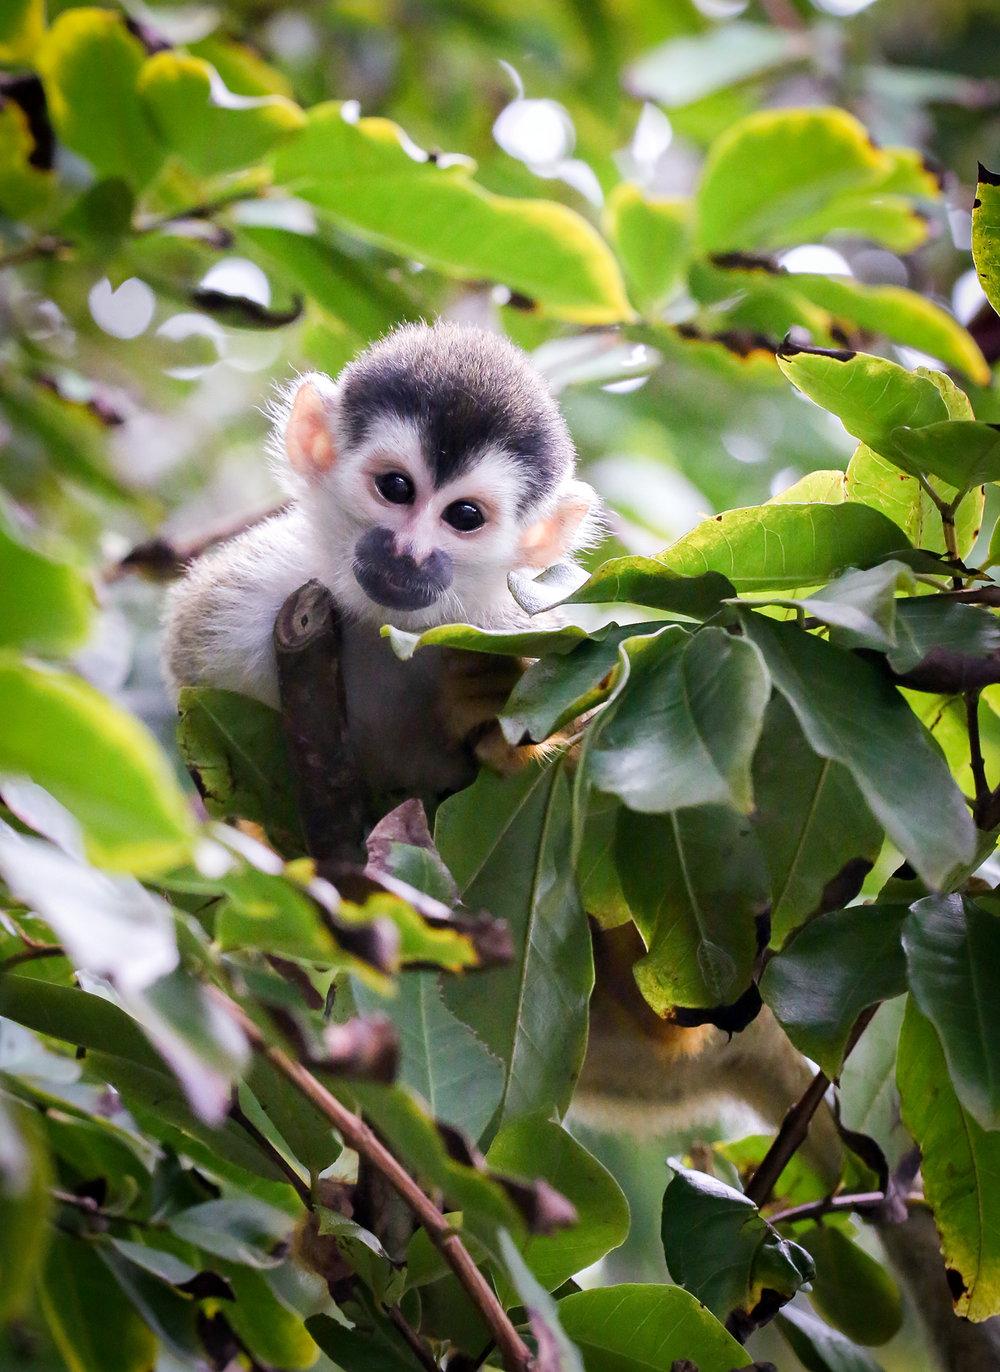 Squirrel Monkey or Forest Elf?